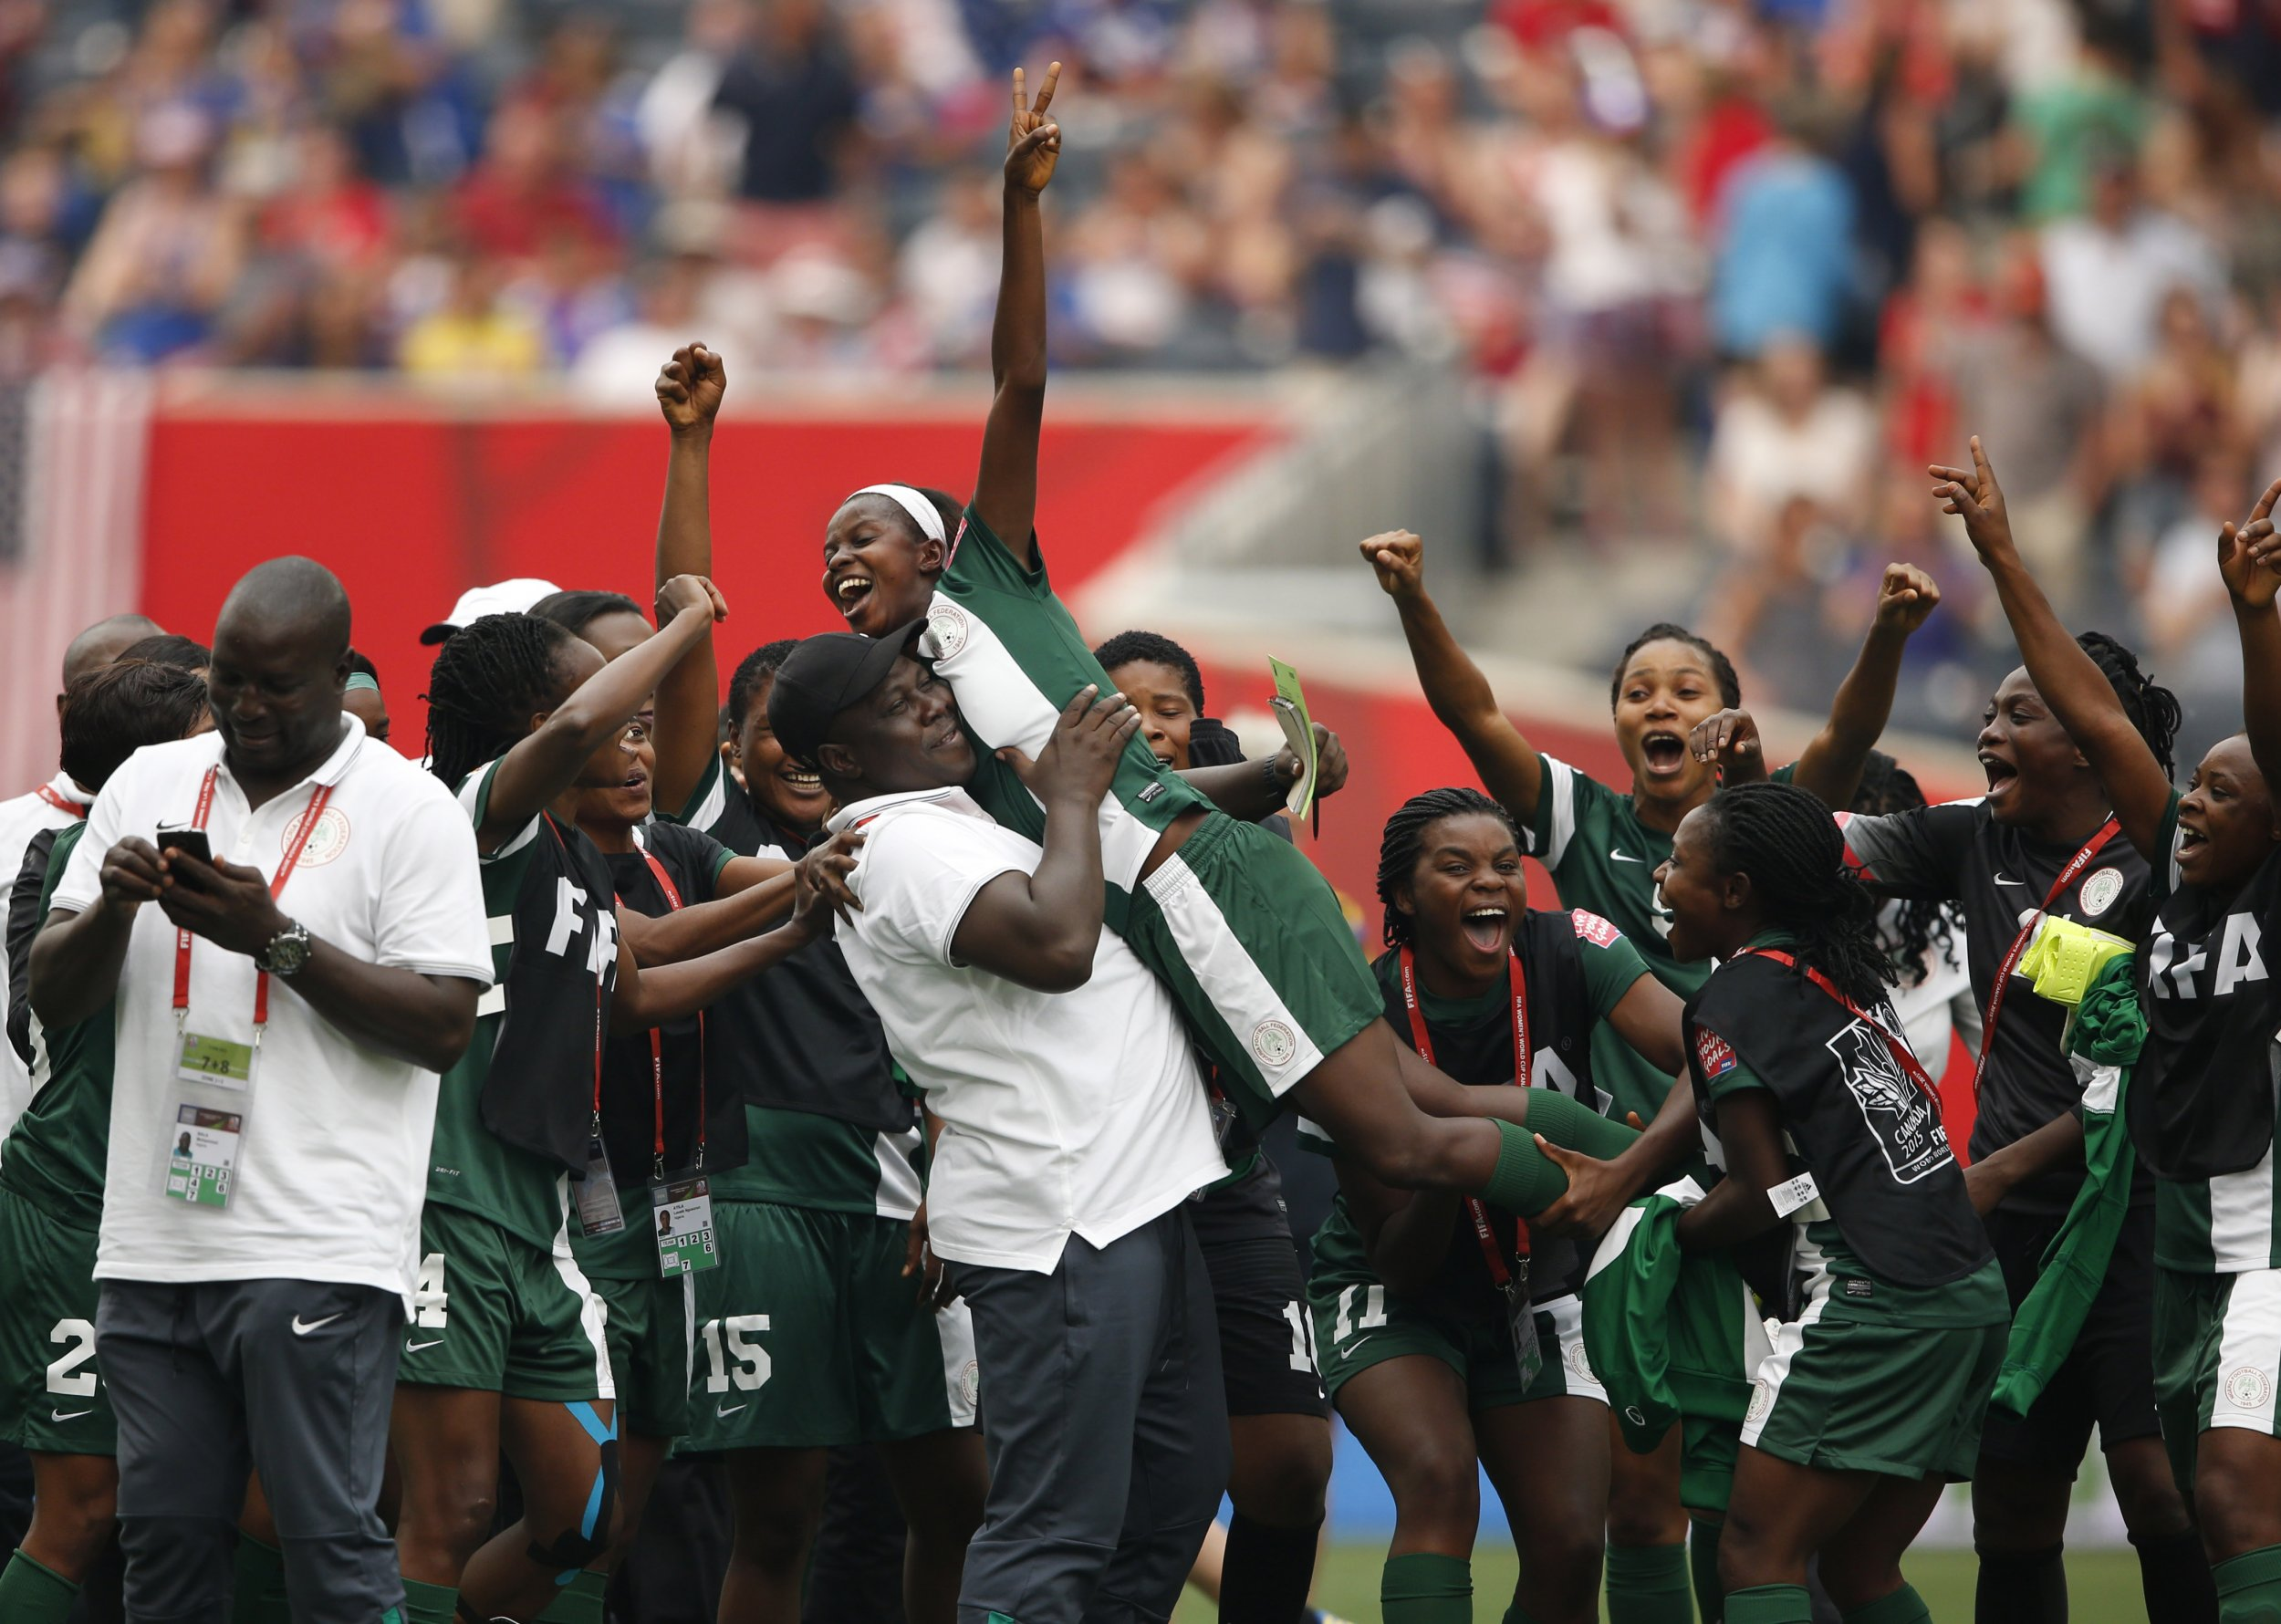 Nigeria women's football team